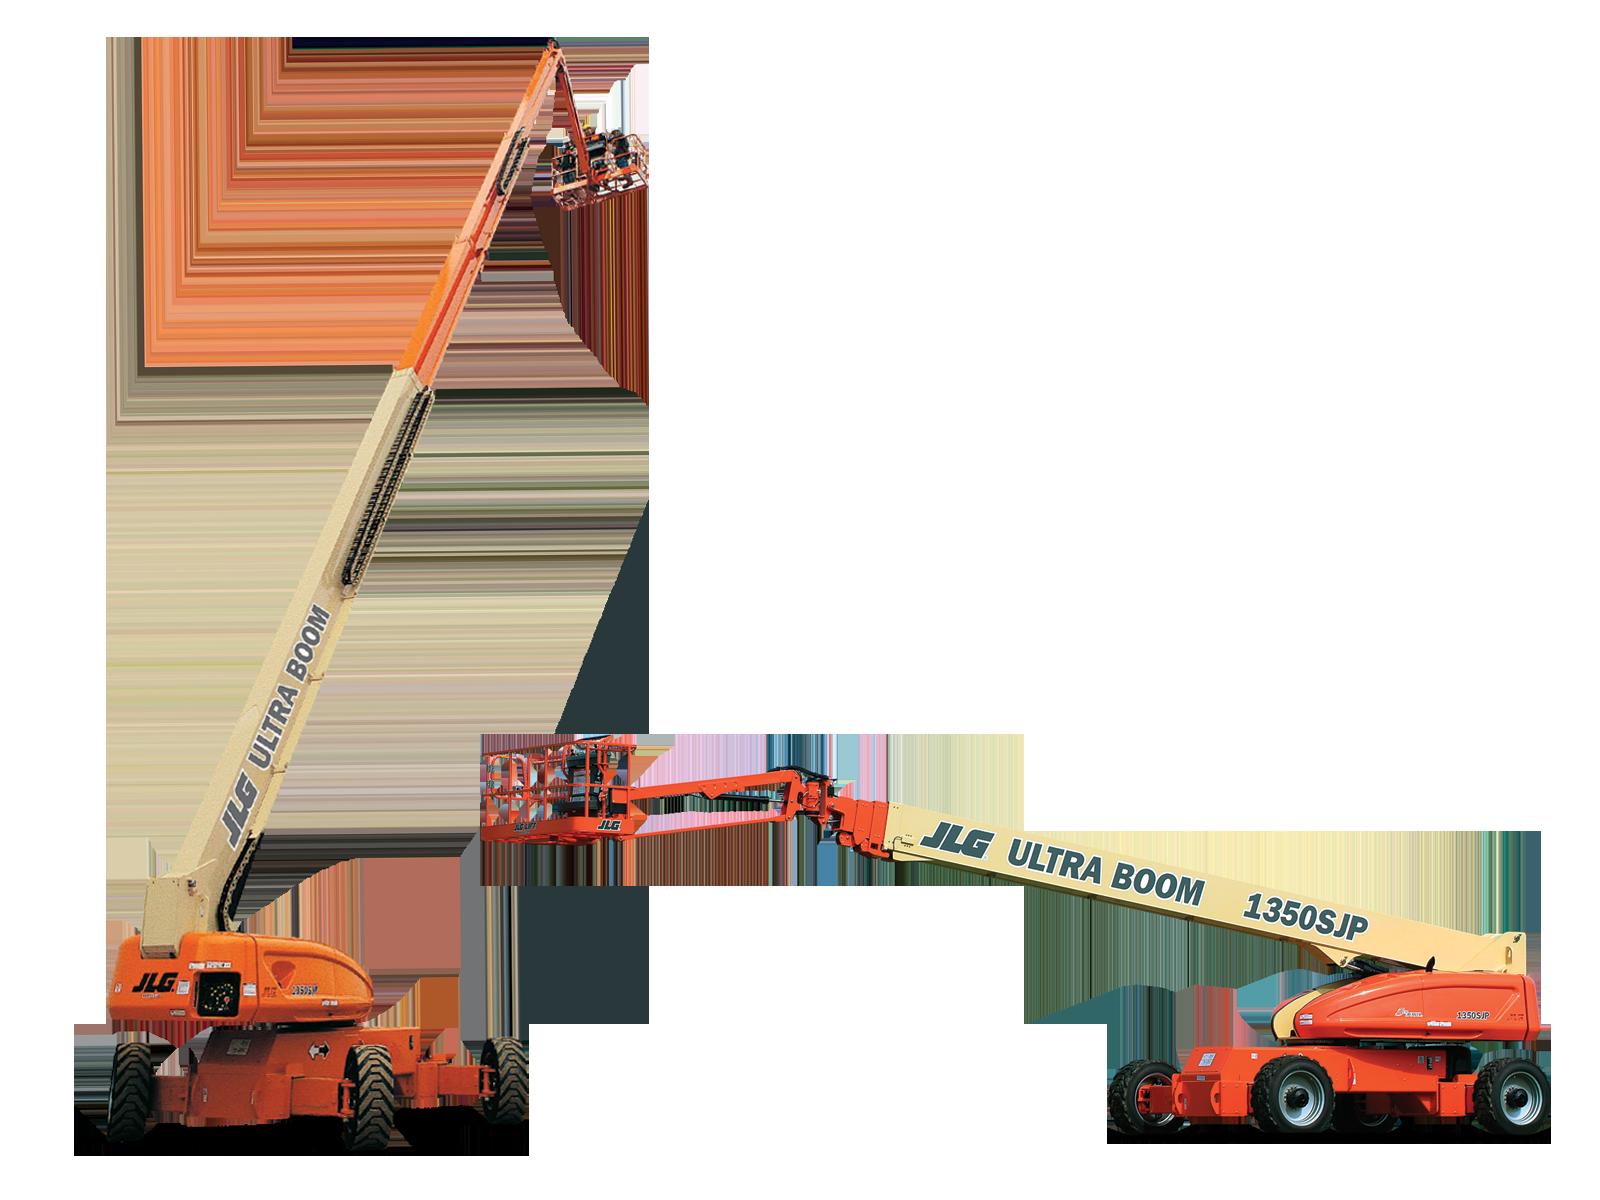 1350sjp telescopic boom lift jlg rh jlg com jlg lift 600s manual jlg lifts manual 1930es blinking light codes